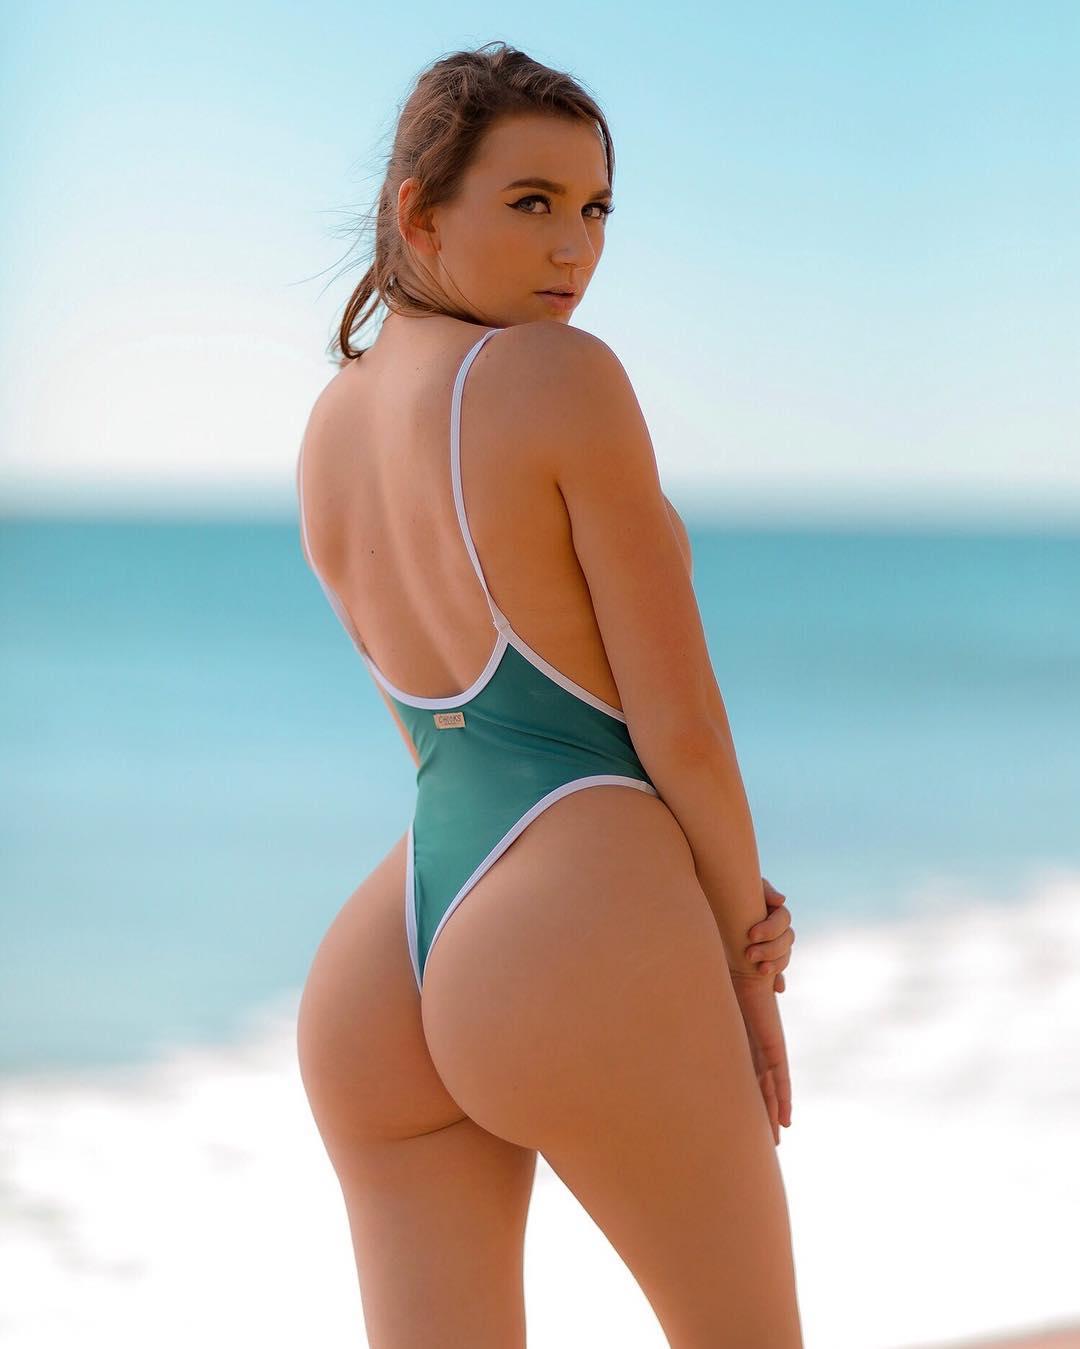 Shut O. reccomend Blue anchor bikini